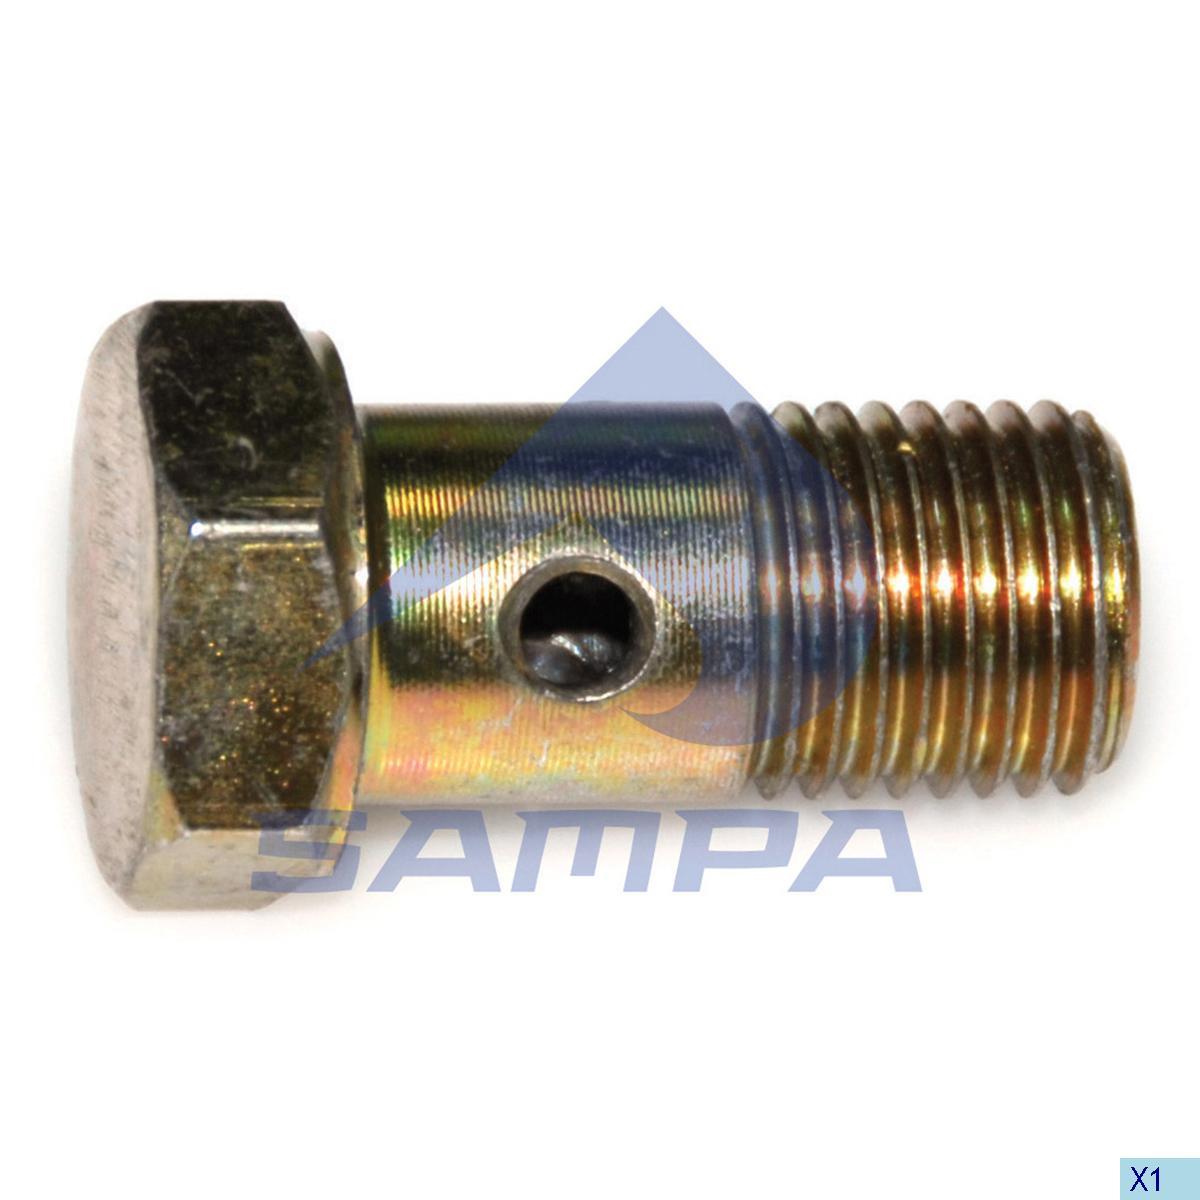 Screw, Injector, Man, Engine